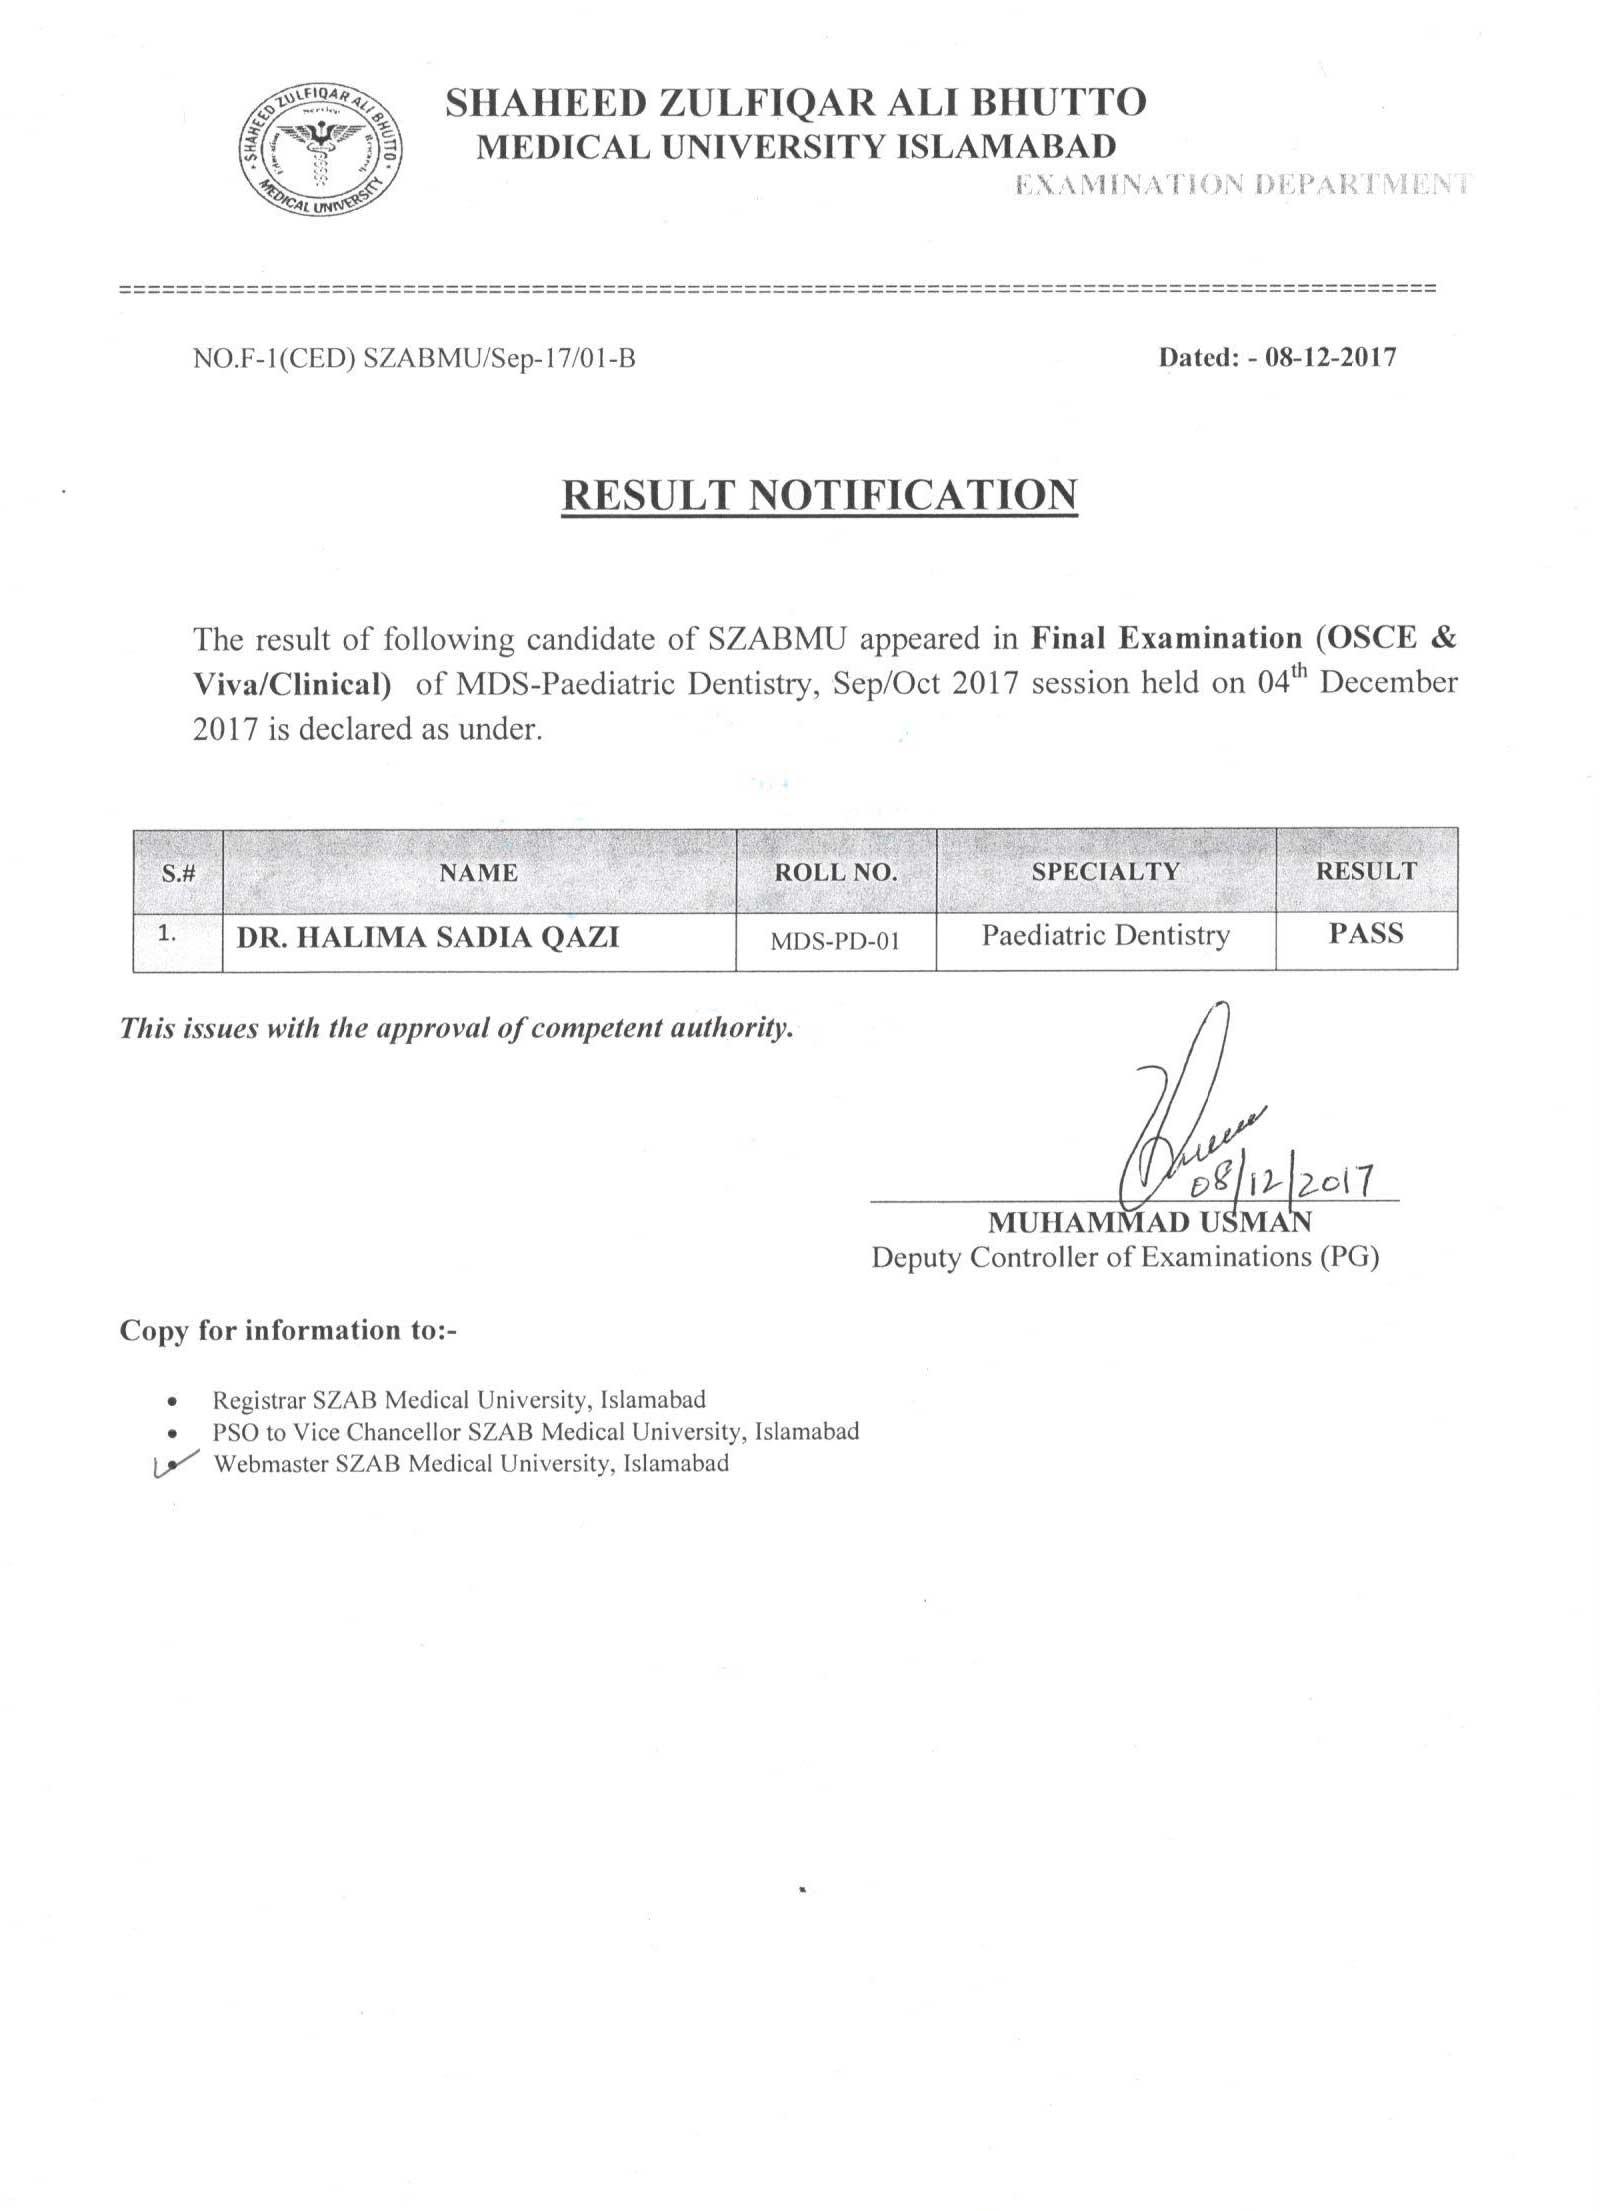 Result Notification - Final Examination (OSCE & Viva/Clinical)